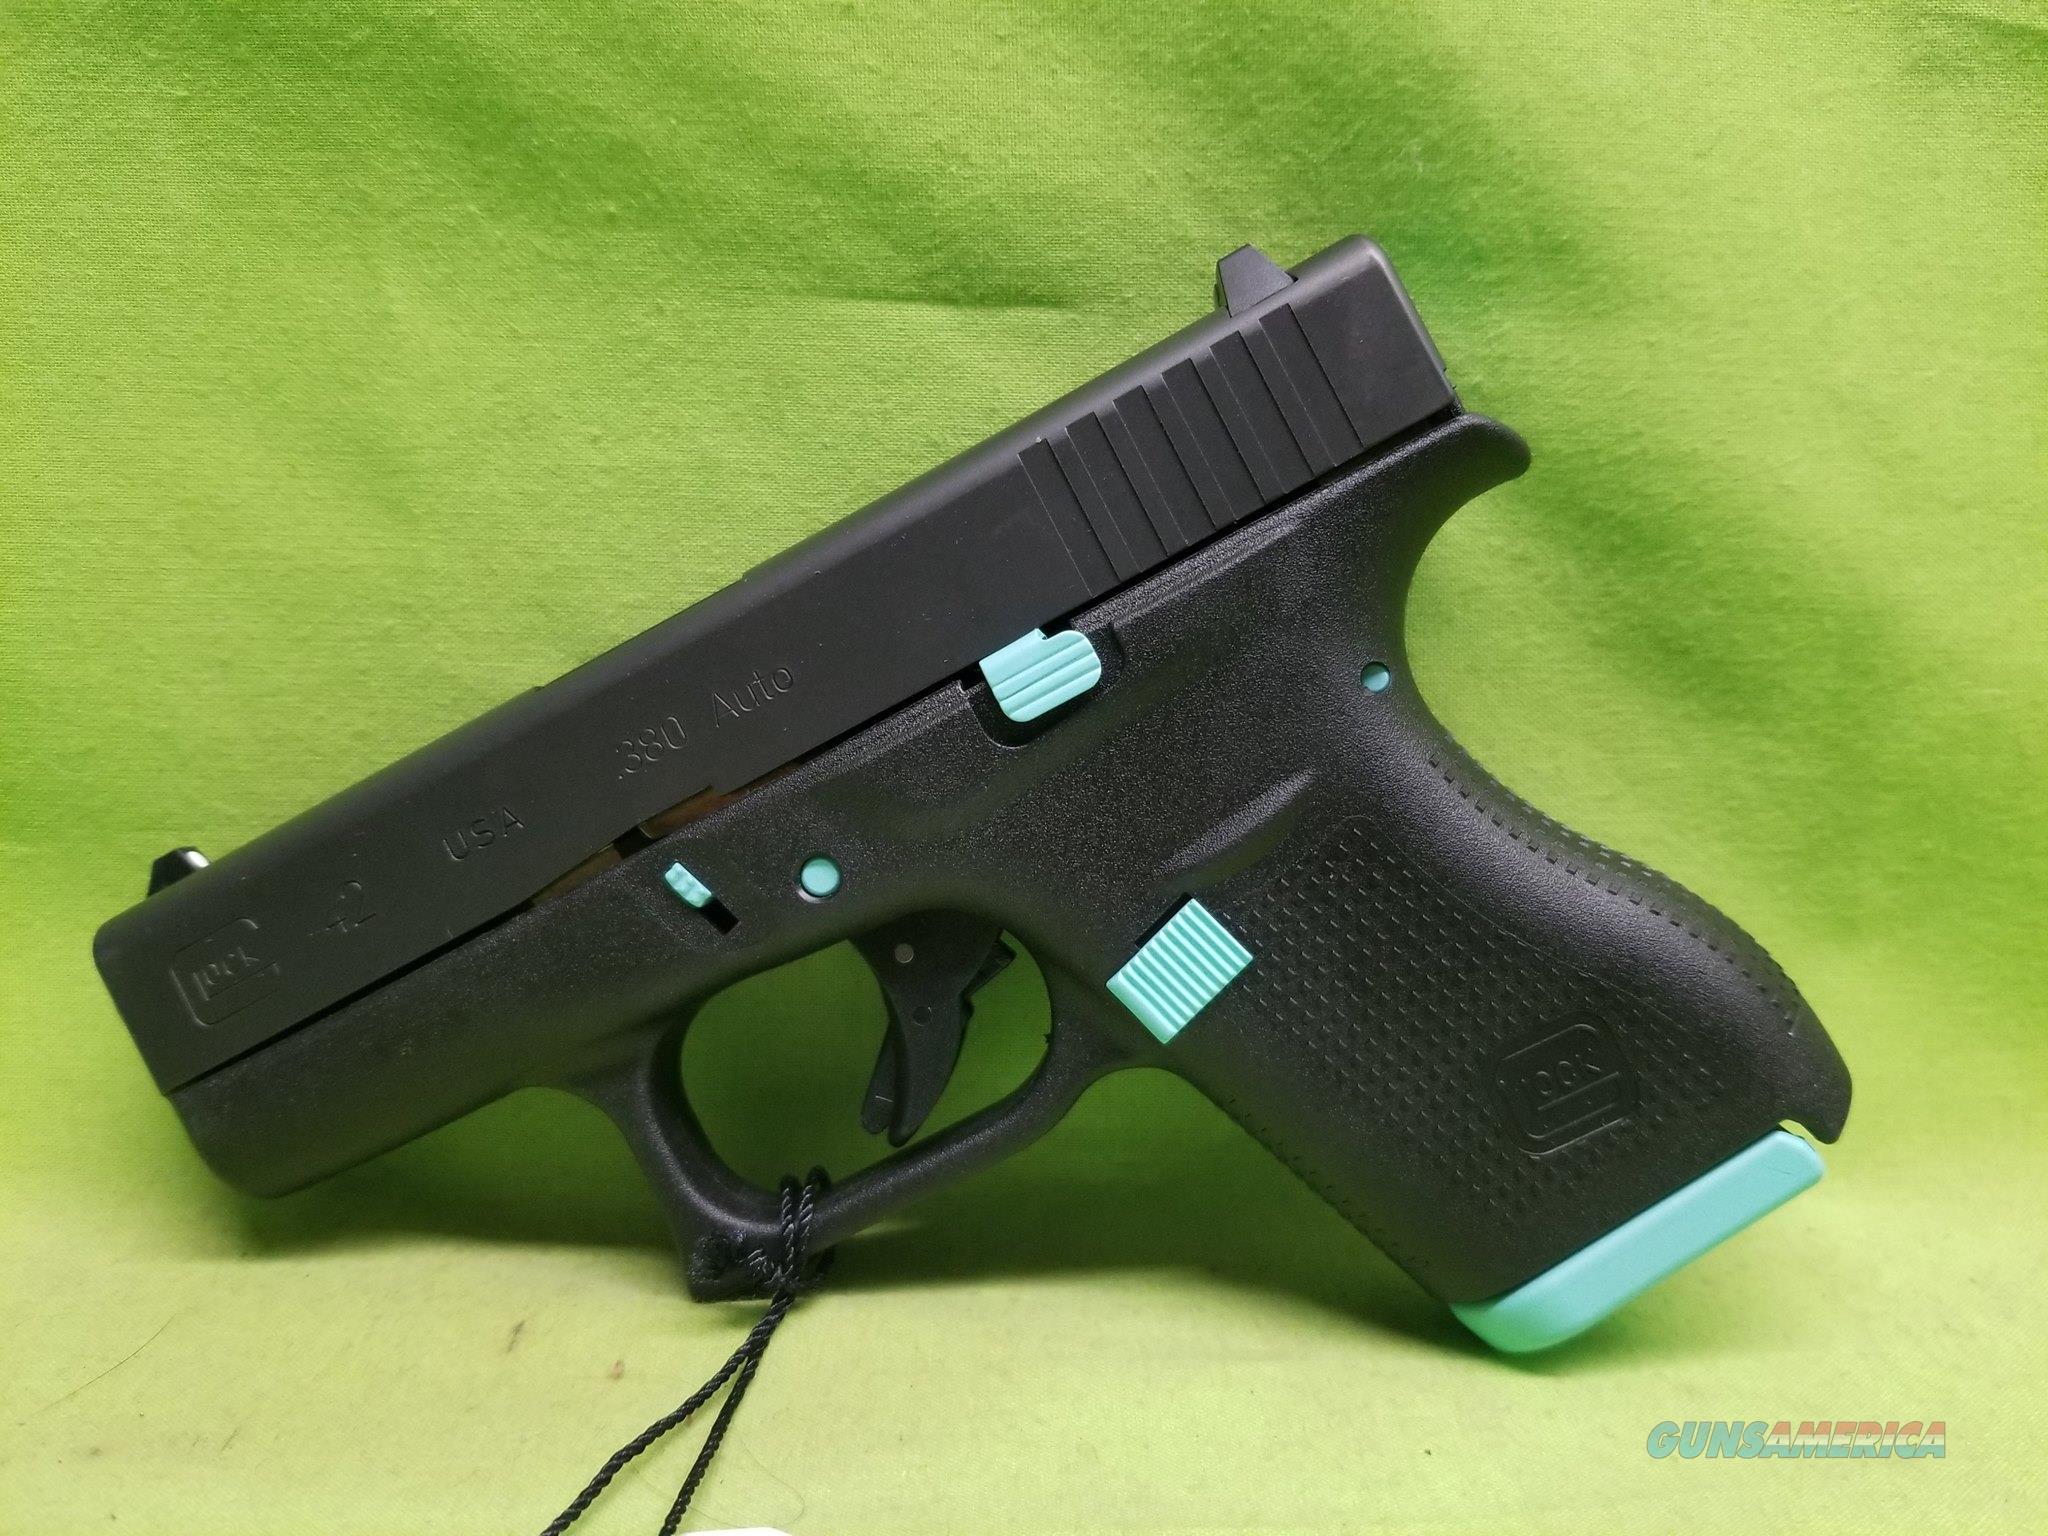 GLOCK 42 .380ACP 380 6RD ROBIN EGG BLUE TIFFANY  Guns > Pistols > Glock Pistols > 26/27